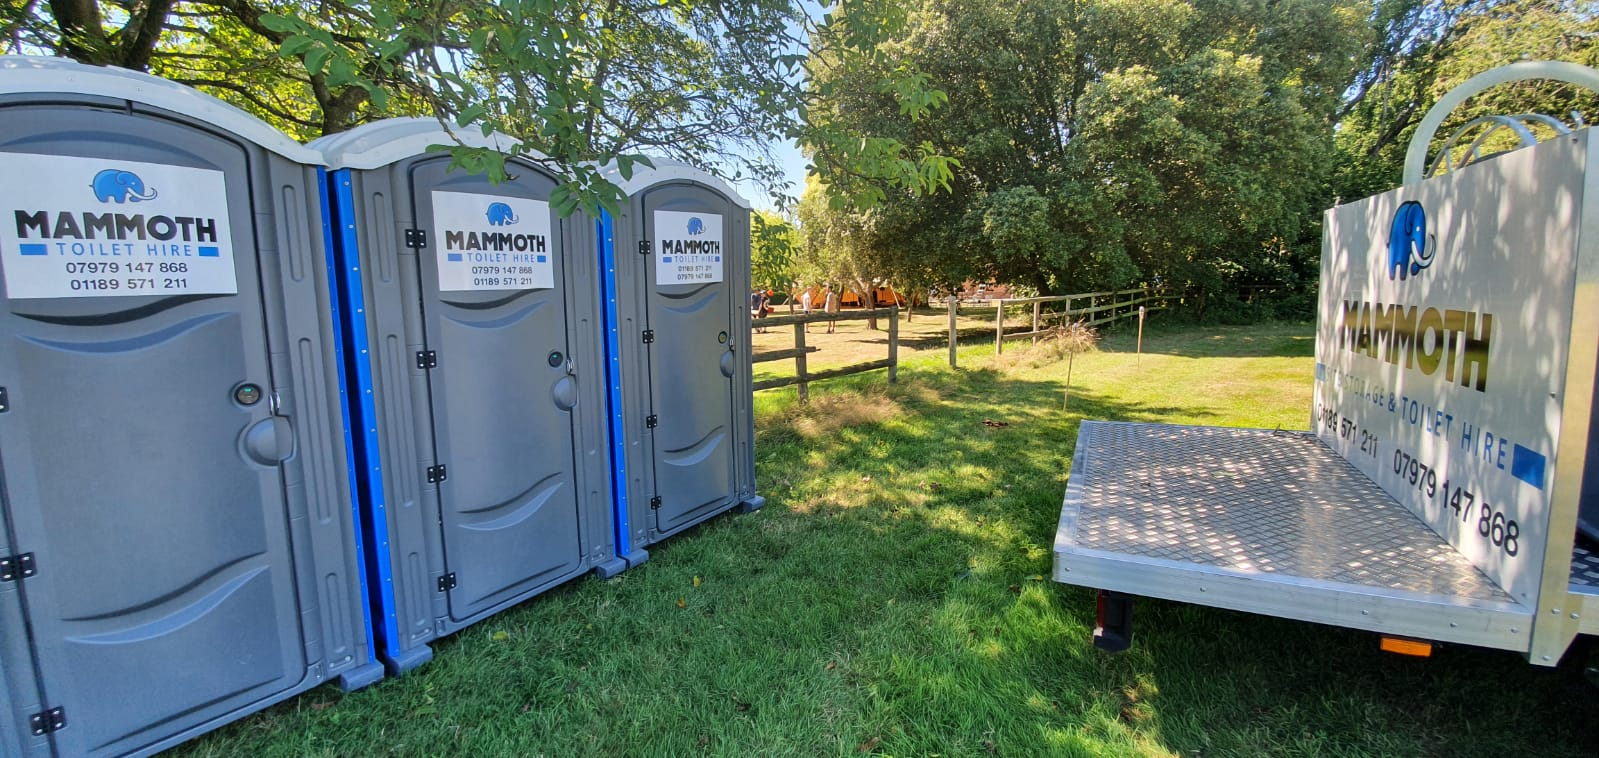 Book hire toilets